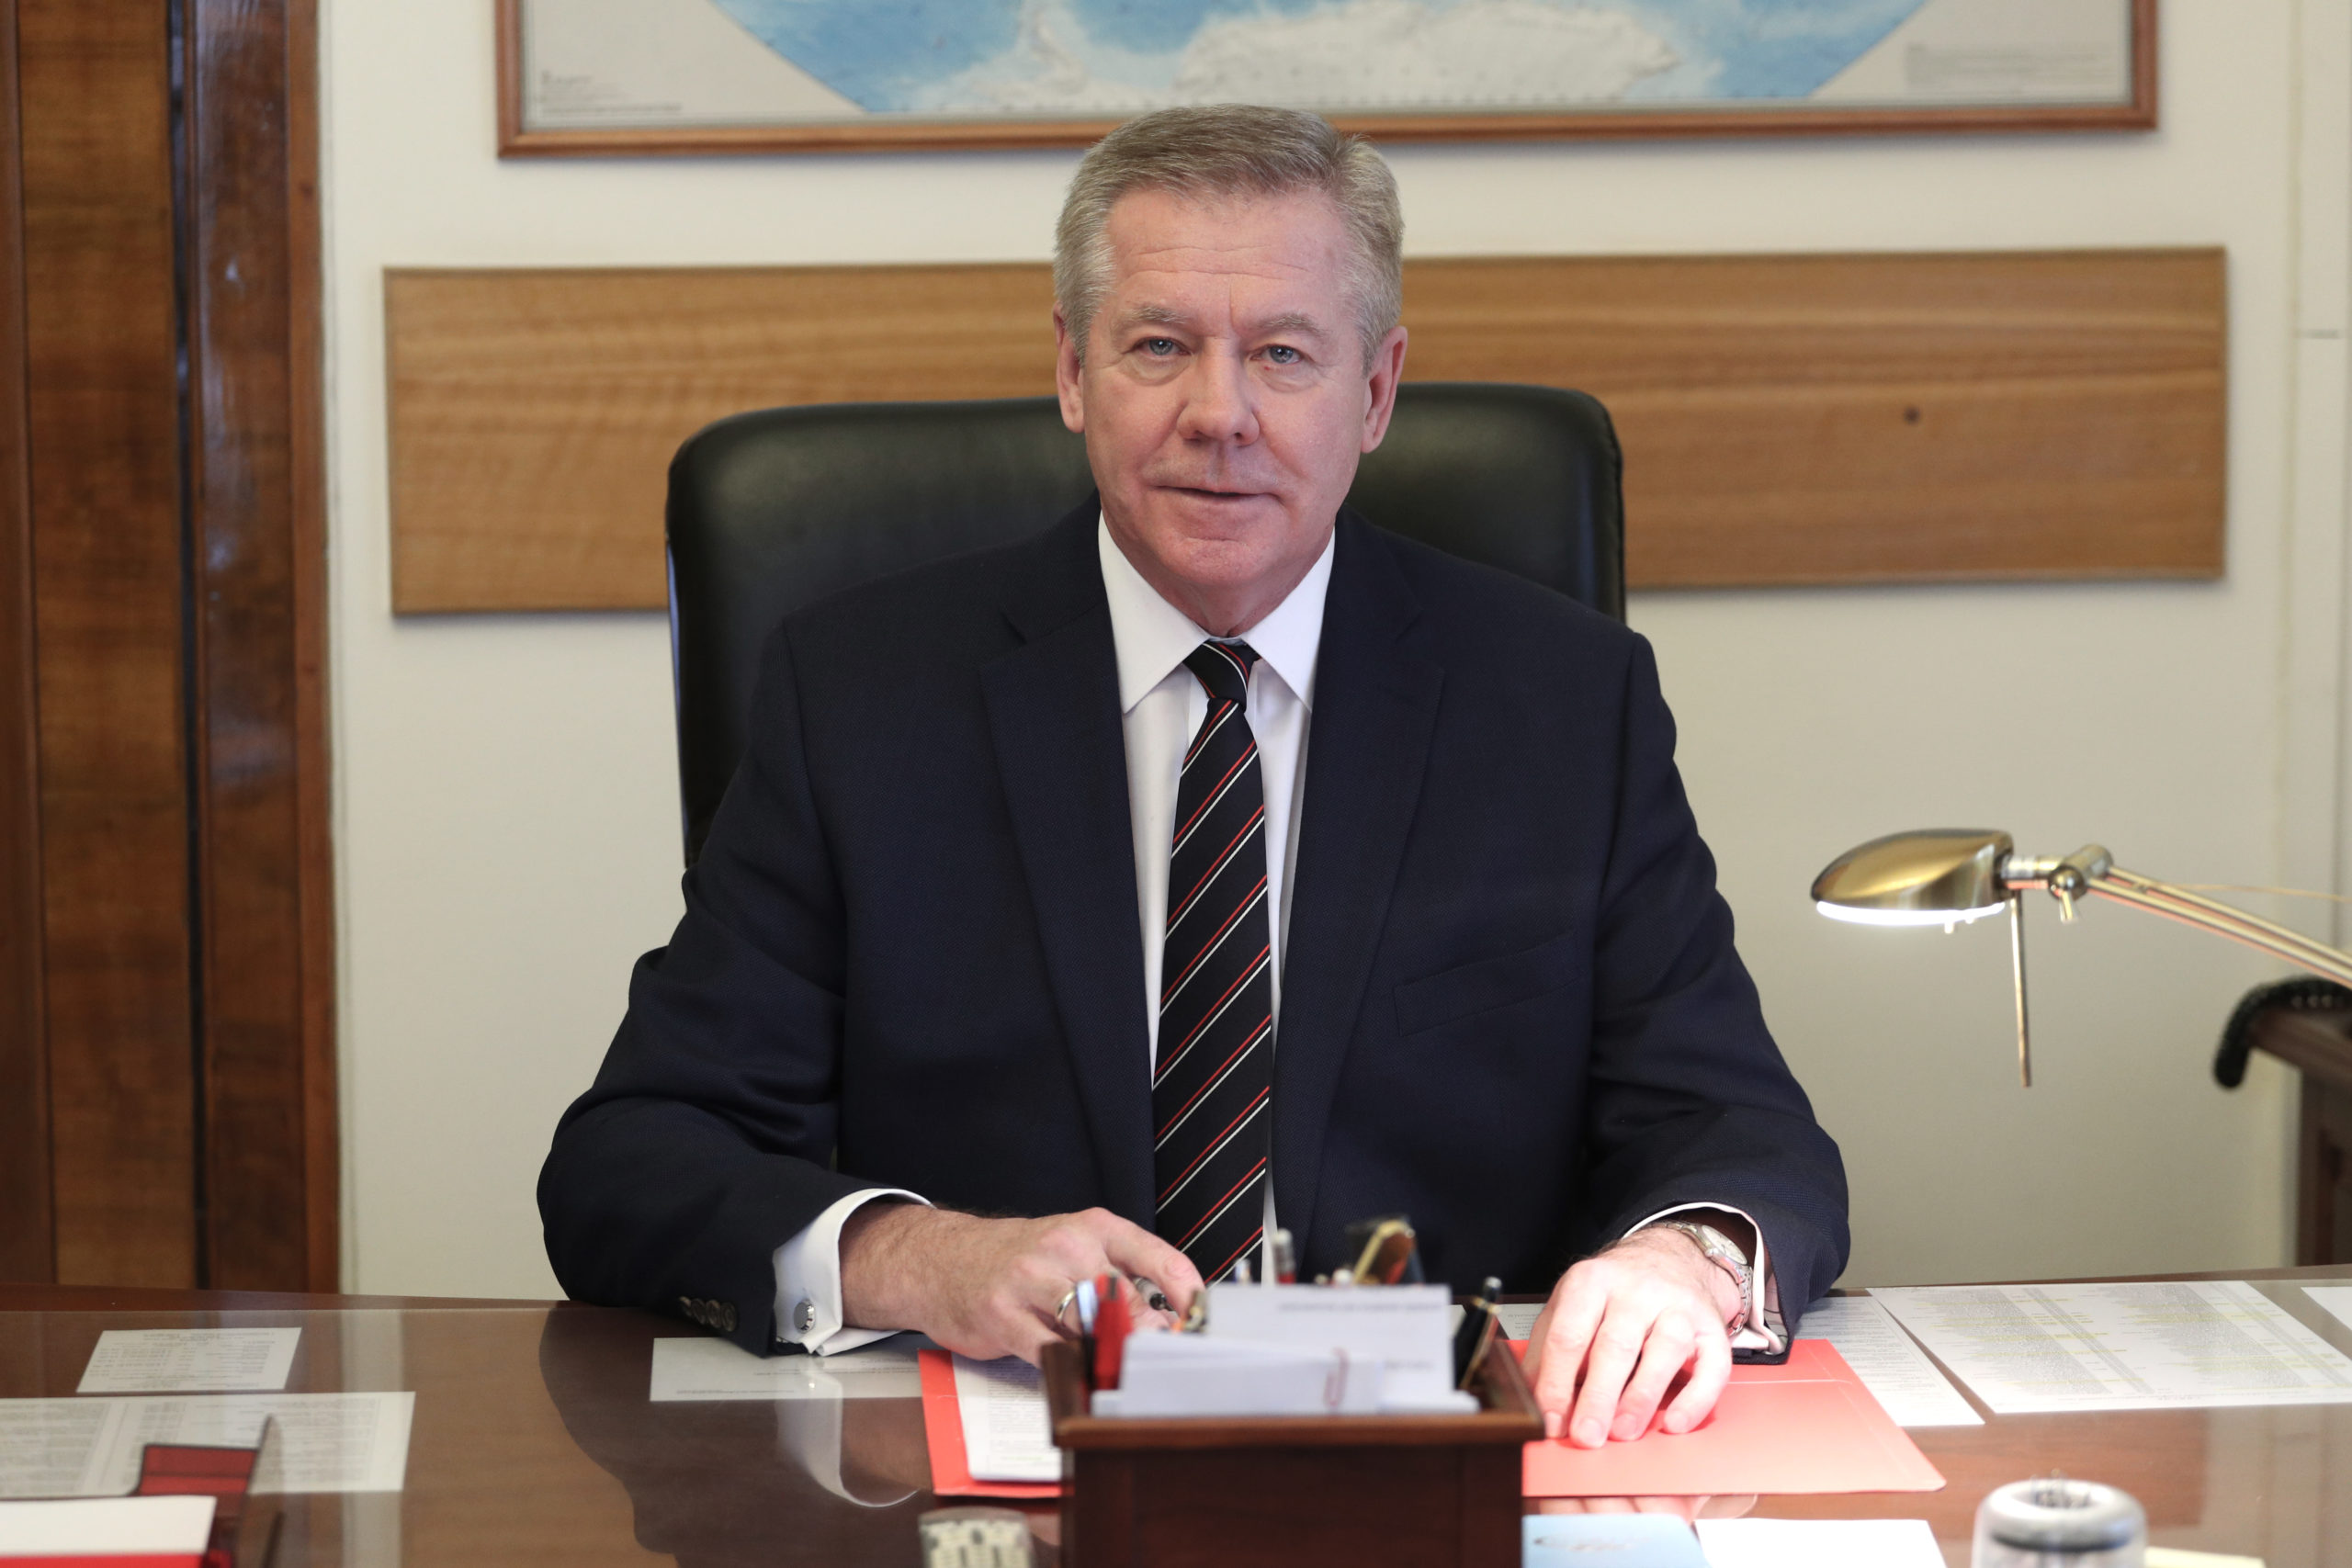 His Excellency Gennady Gatilov Ambassador of the Russian Federation